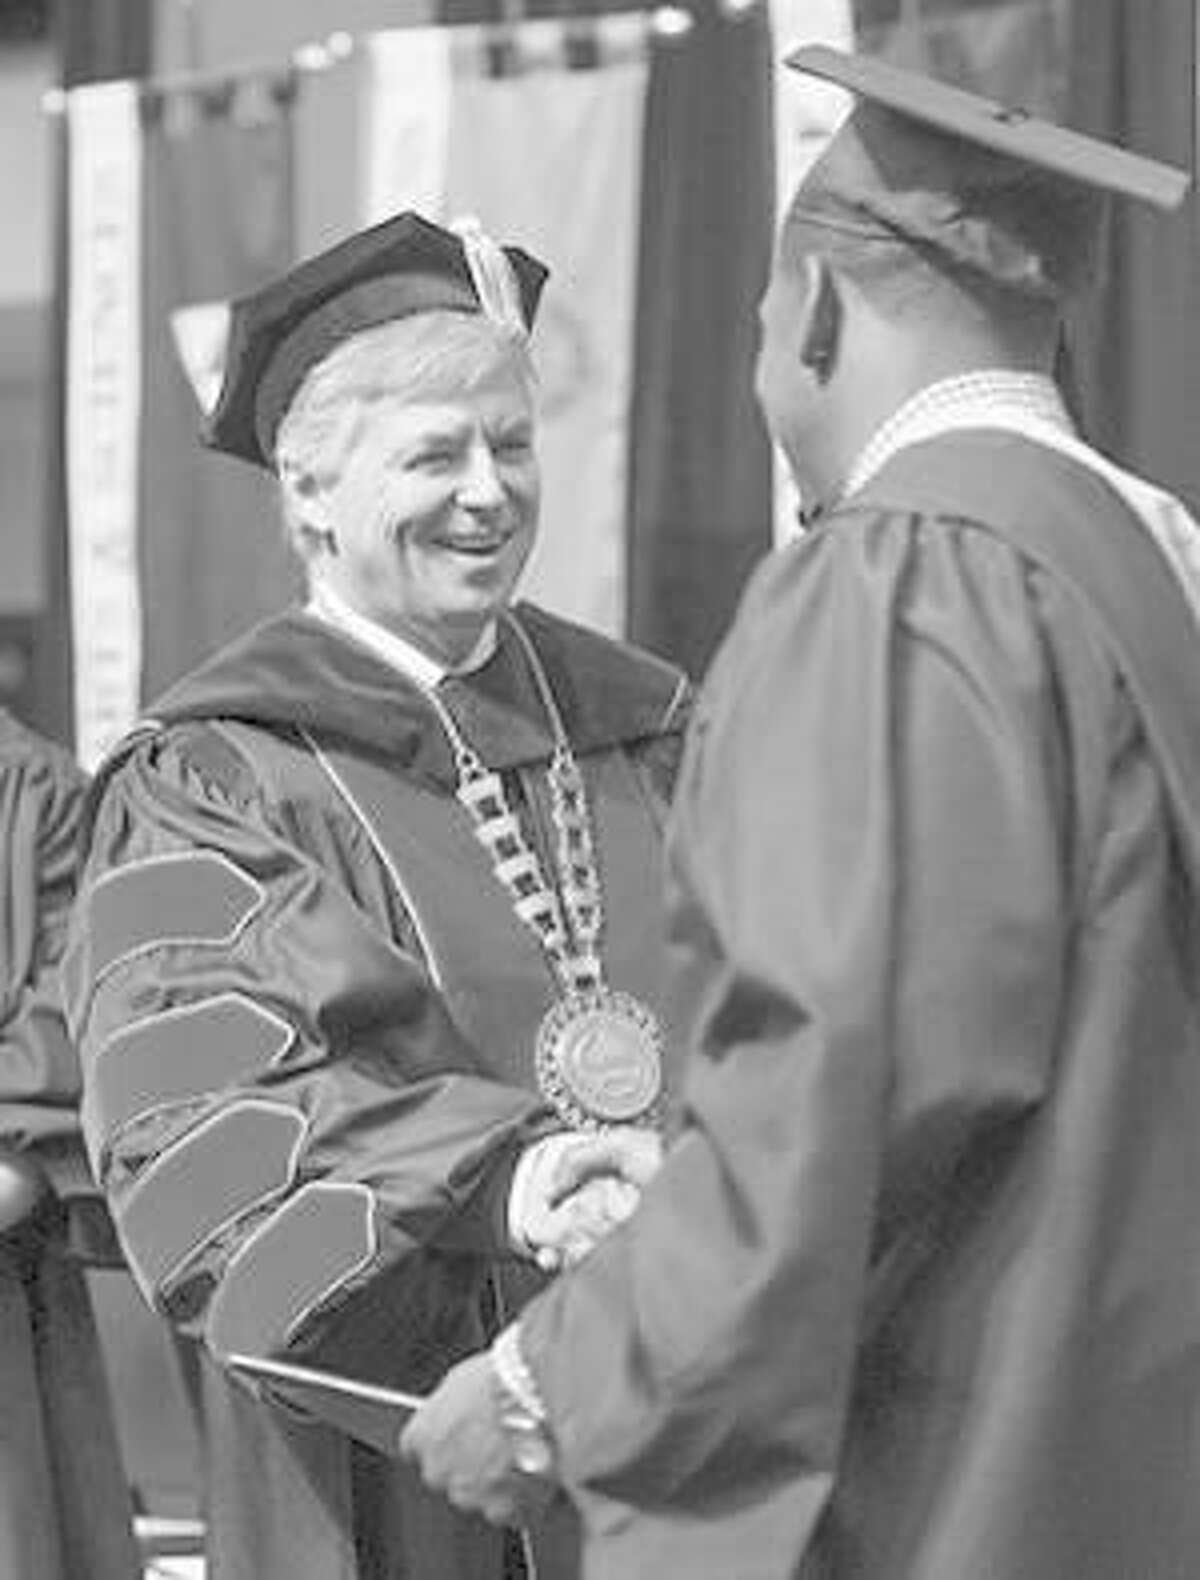 SIUE Chancellor Randy Pembrook congratulates a graduate at the school's fall commencement Saturday.